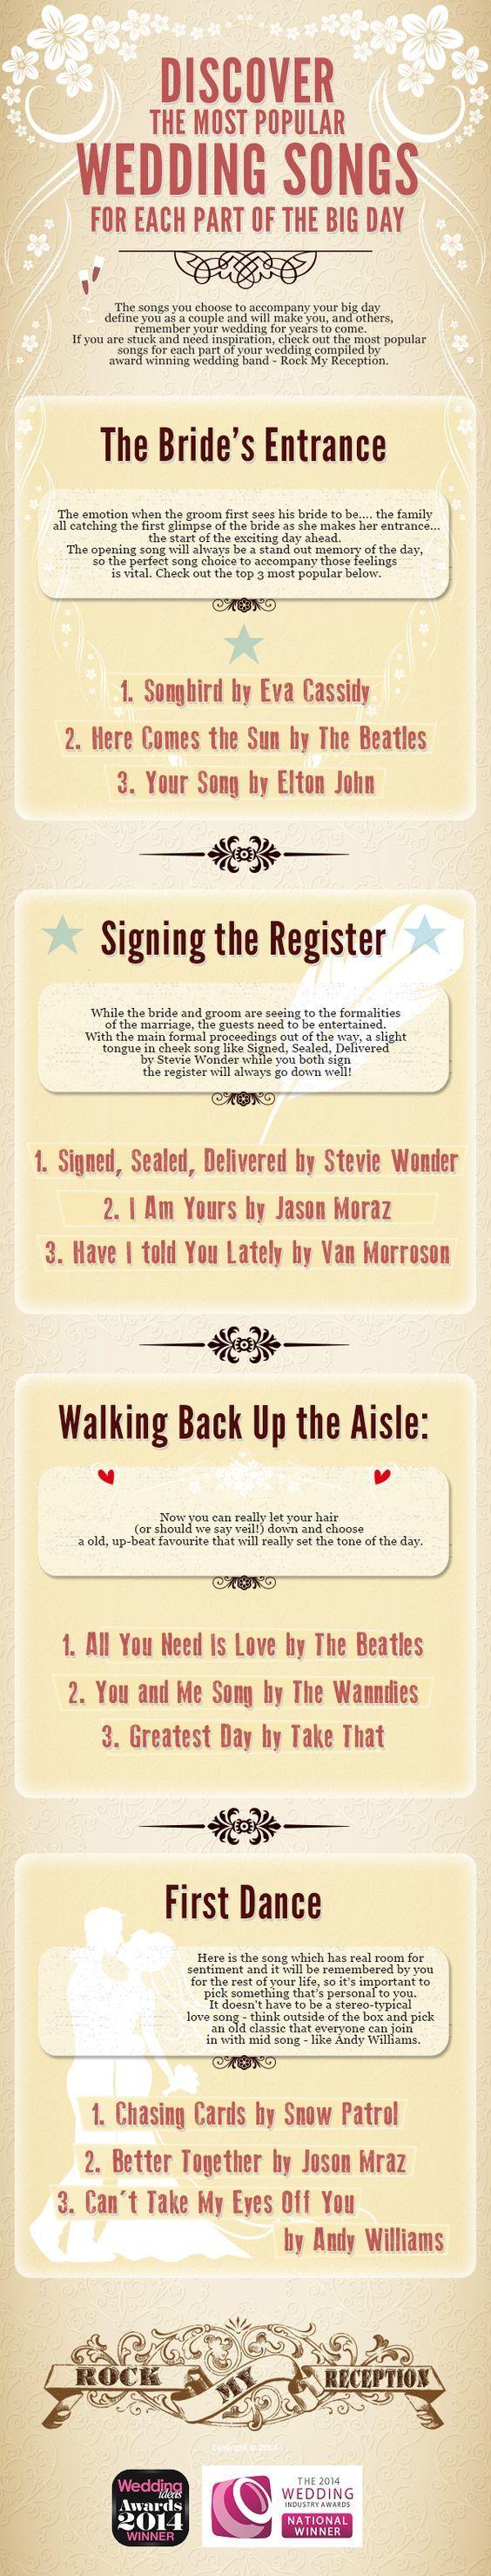 Best 25 Most Popular Wedding Songs Ideas On Pinterest